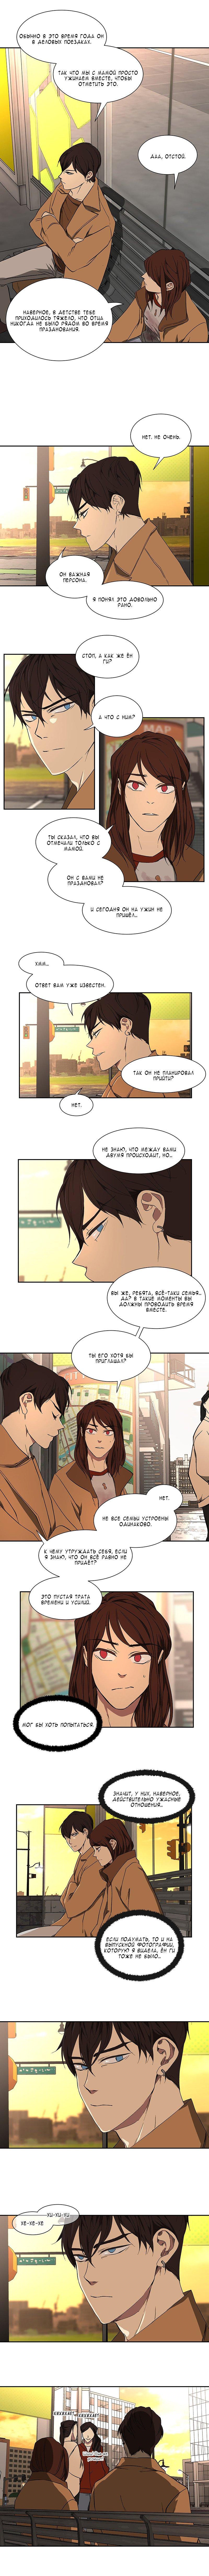 Манга Я люблю Ю / I love Yoo  - Том 1 Глава 41 Страница 6